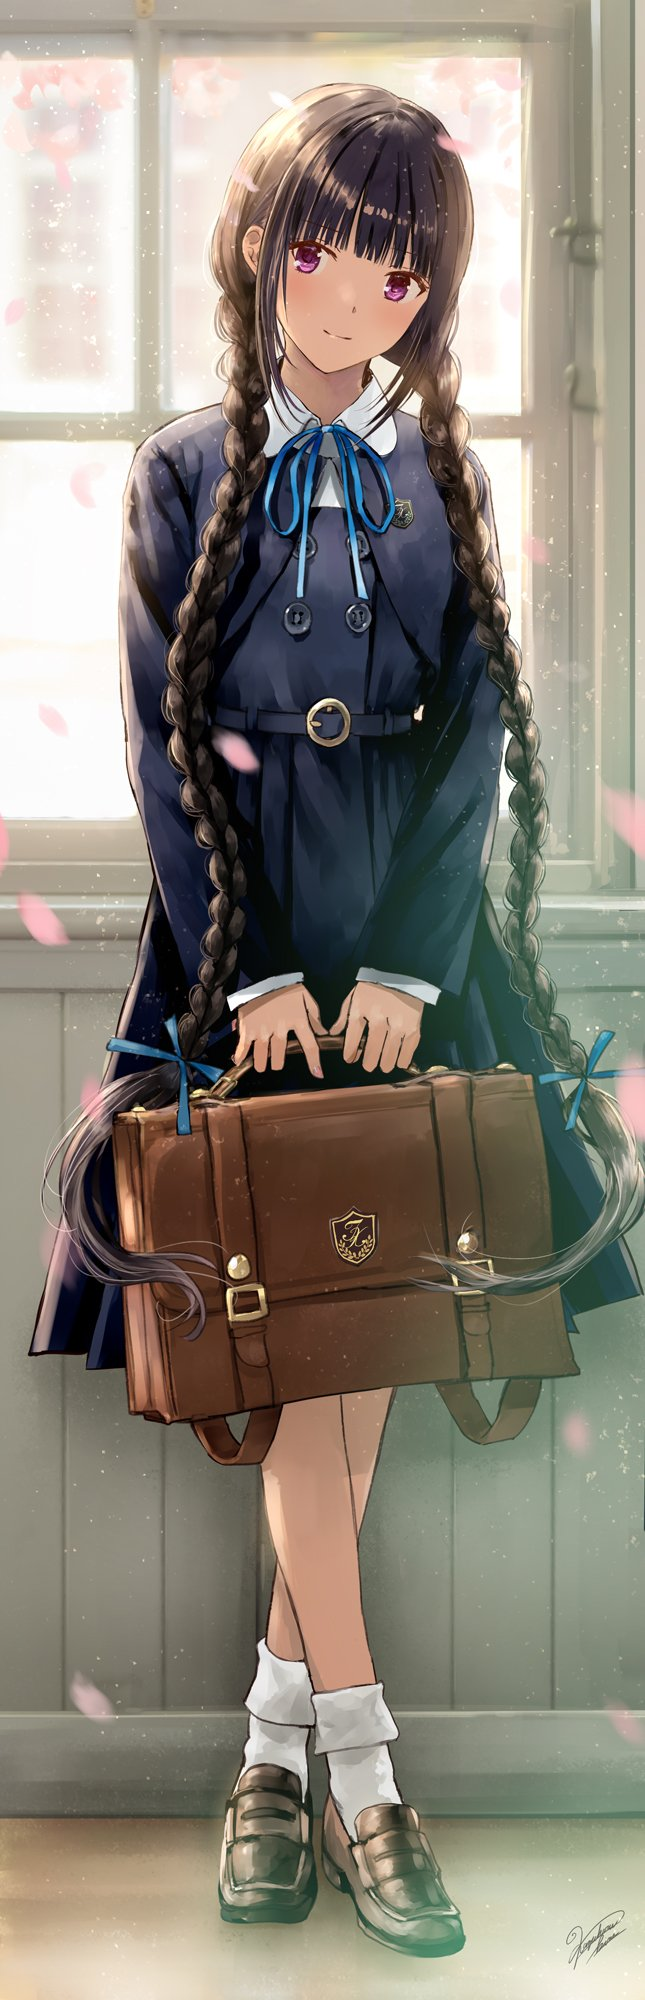 [Azone] 1/3 Happiness Clover - Yukari - Kazuharu Kina School Uniform Collection  Edspfl10